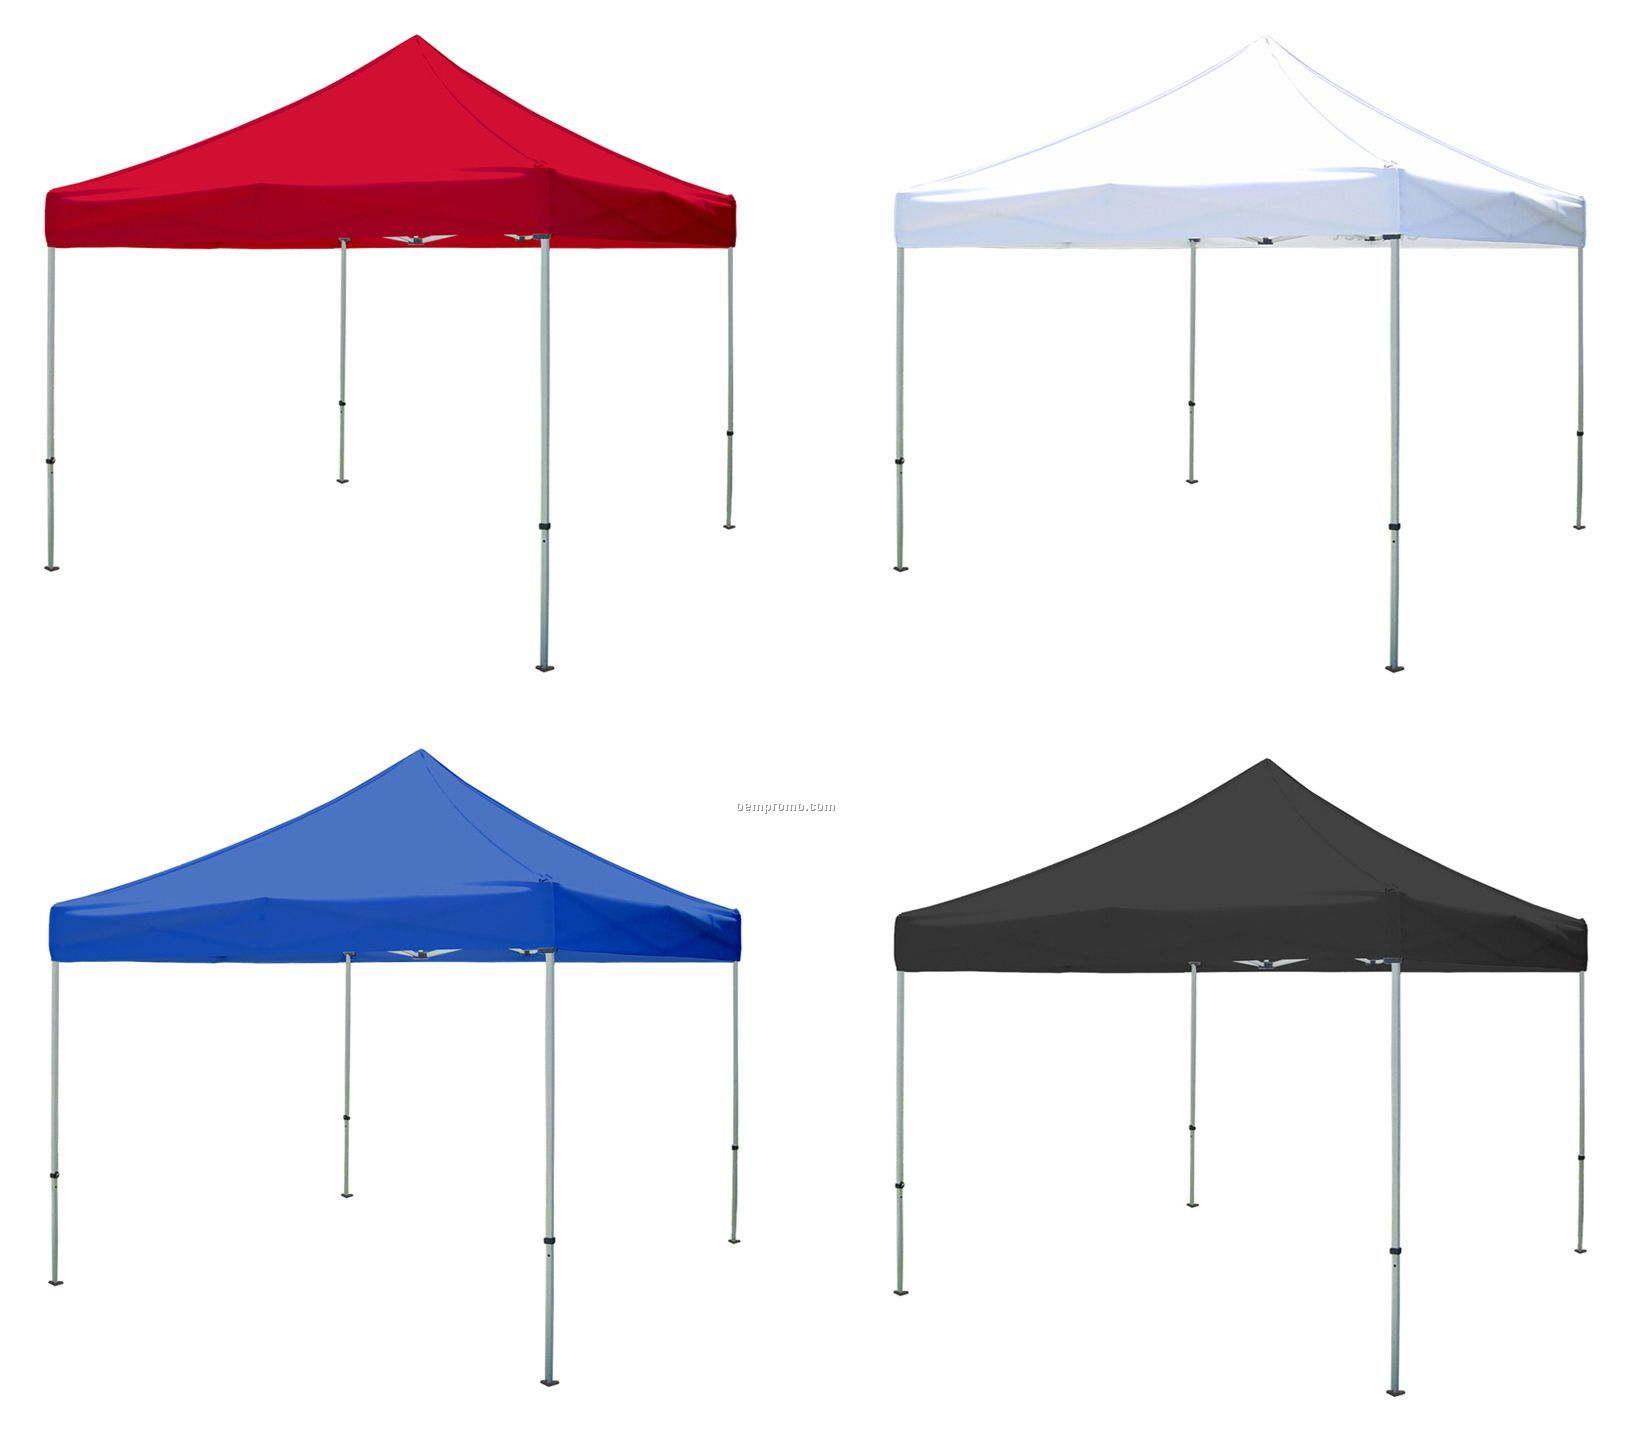 10x10 Pop Up Canopy Tent W/ Steel Frame (No Art)  sc 1 st  Oempromo.com & 10x10 Pop Up Canopy Tent W/ Steel Frame (No Art)China Wholesale ...